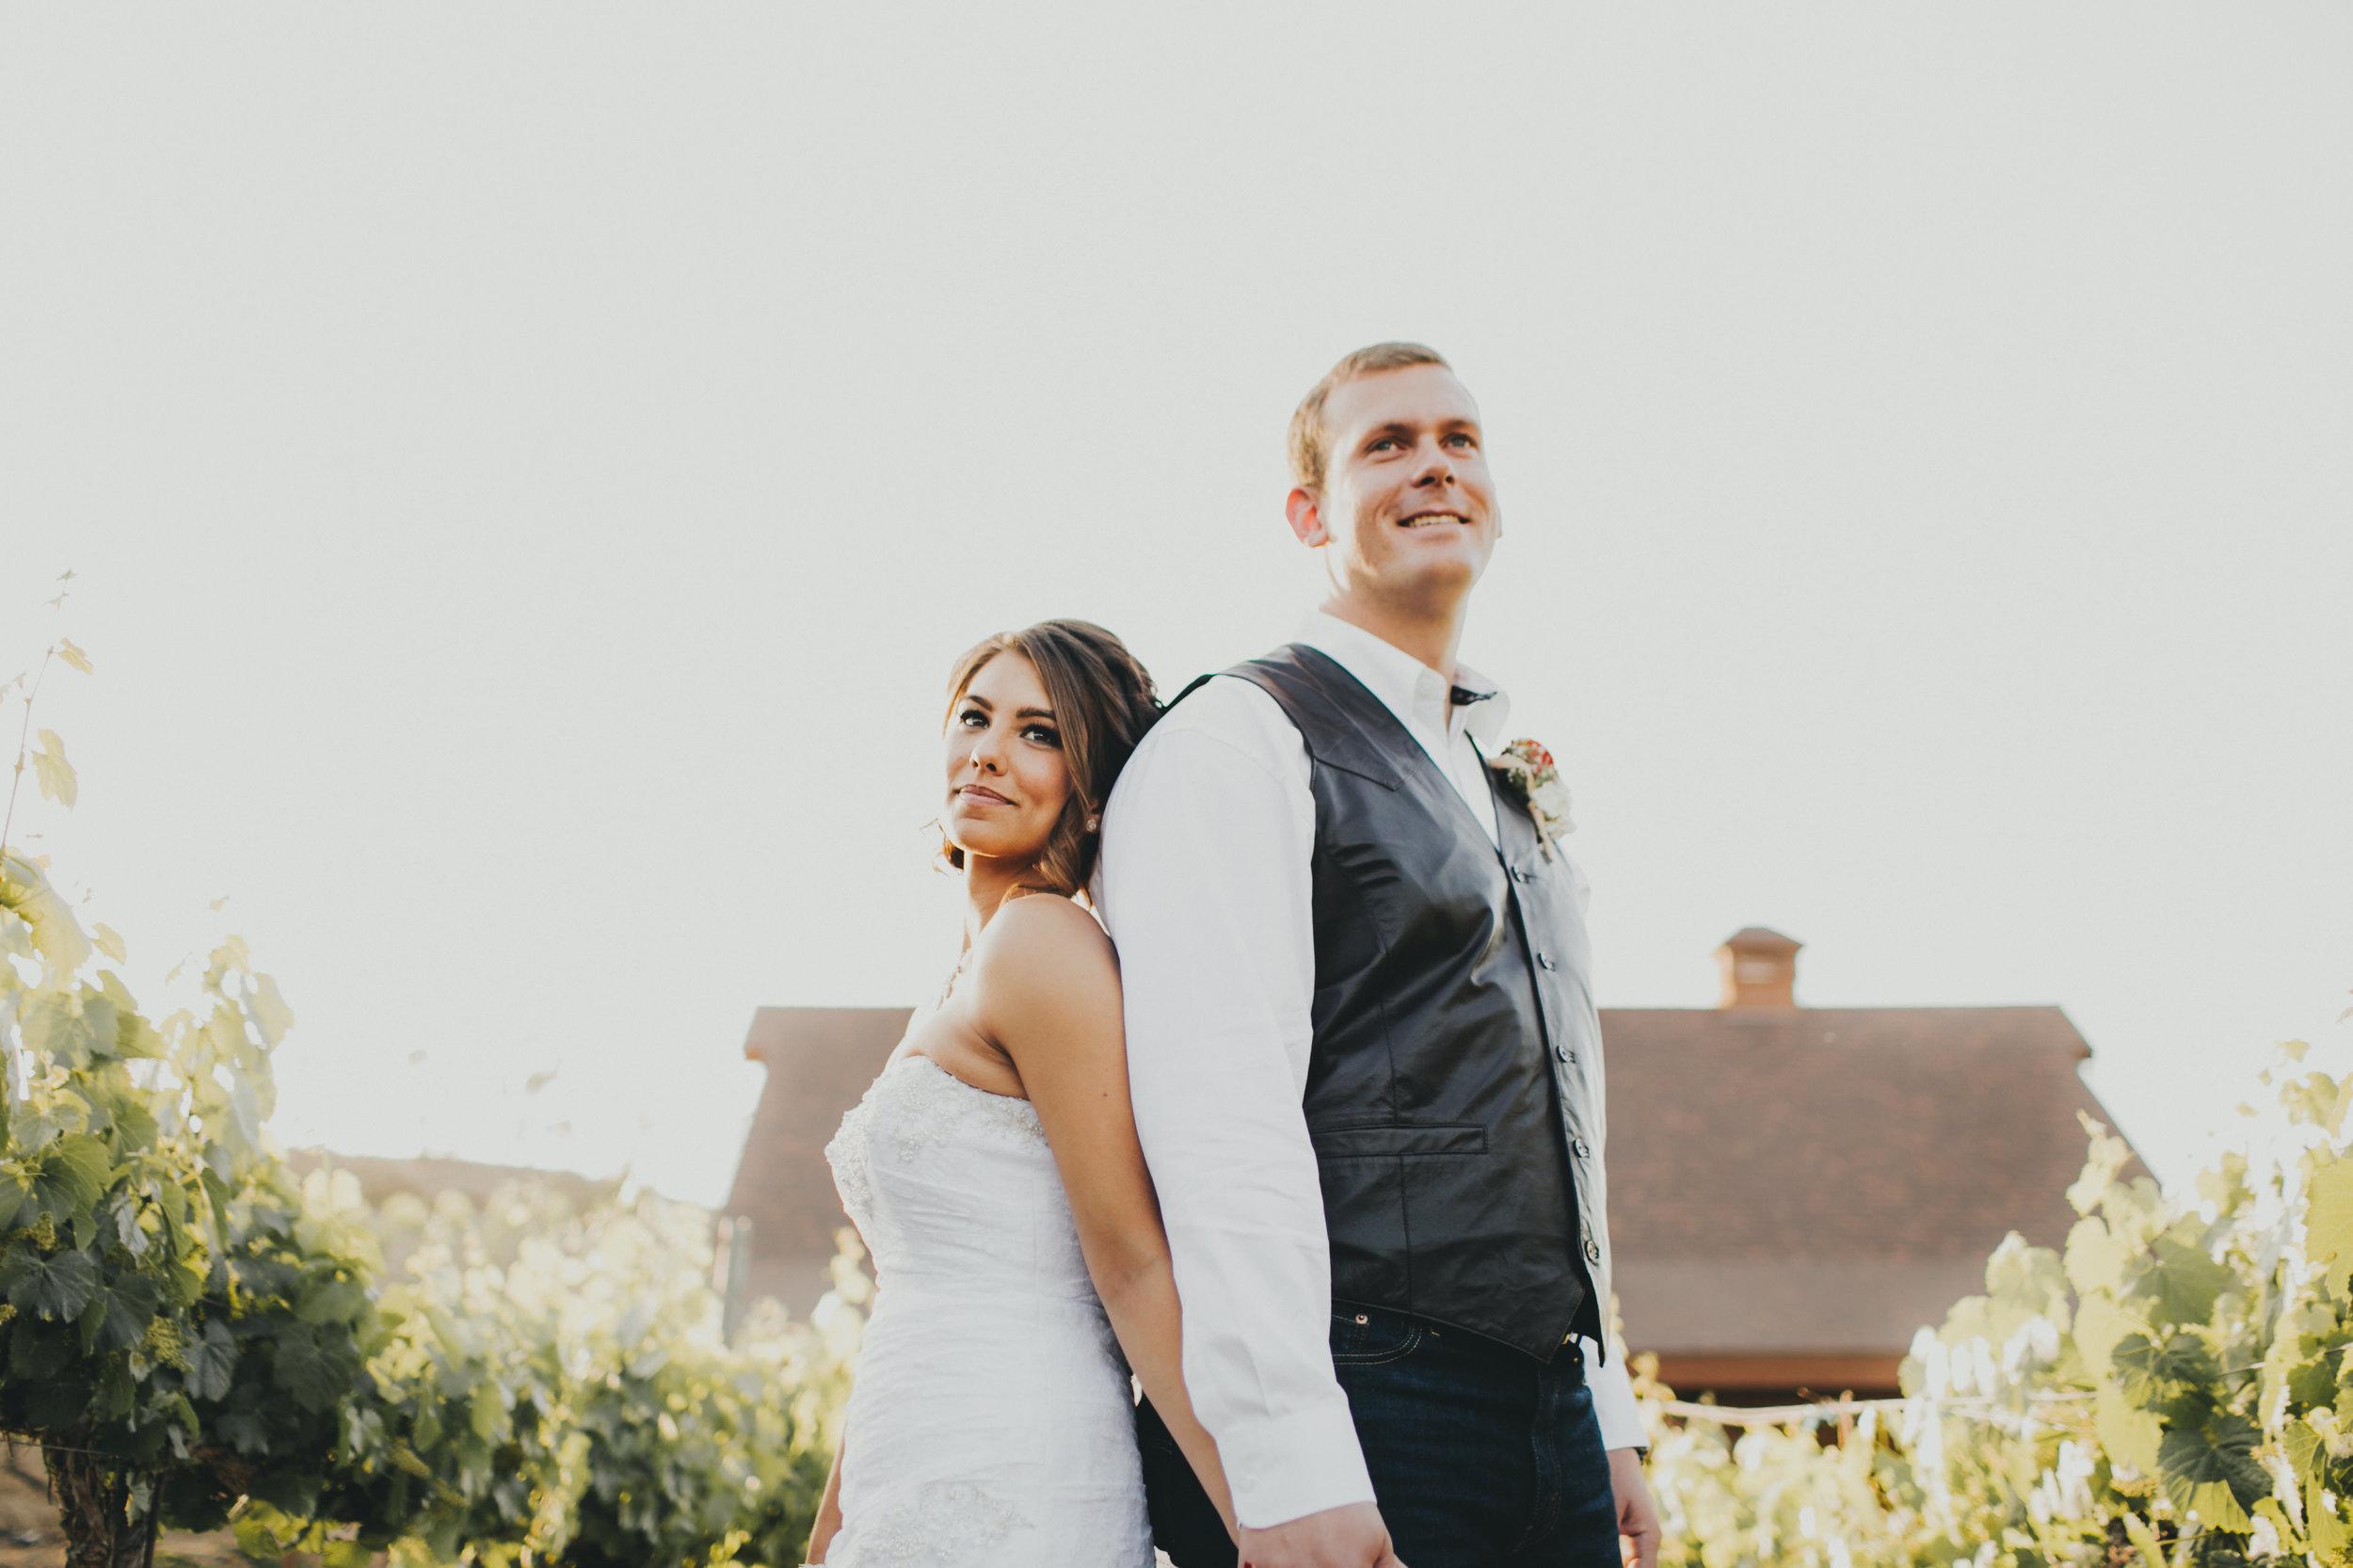 Cheyenne + Jordan - Wedding, Natalie Griffo (84 of 157).jpg